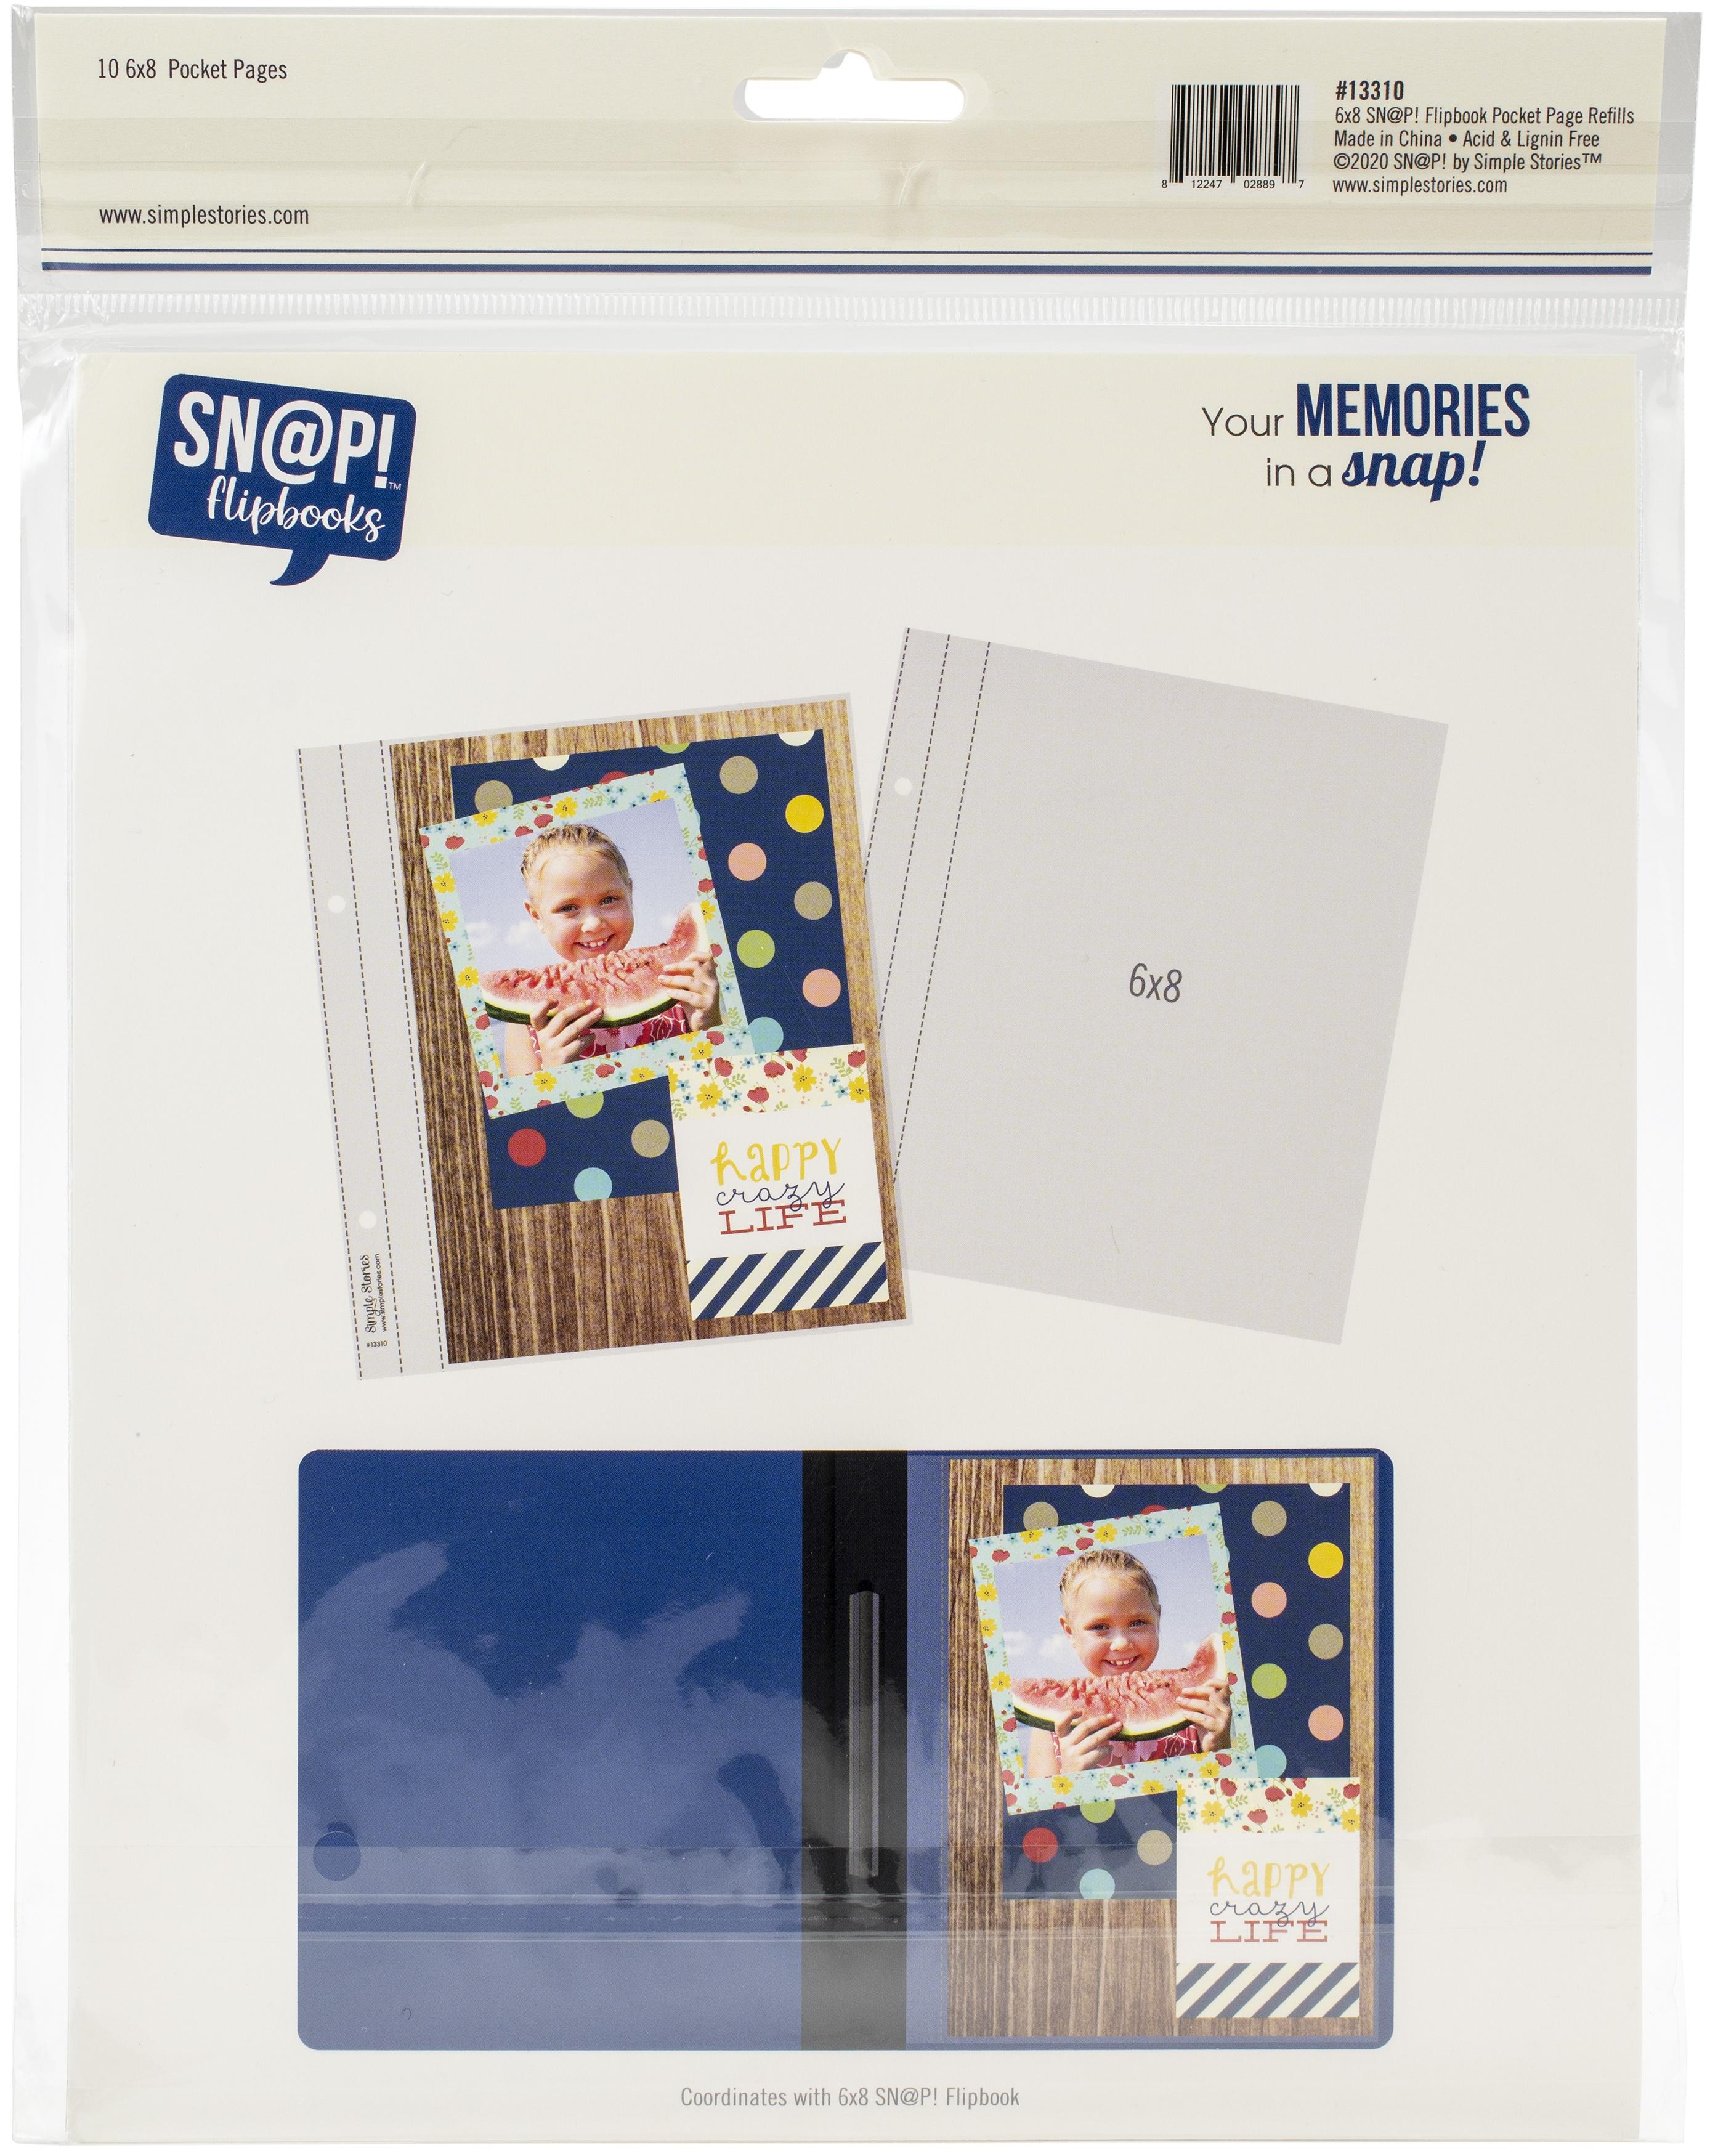 Simple Stories Sn@p! Pocket Pages For 6X8 Flipbooks 10/Pkg-(1) 6X8 Pocket